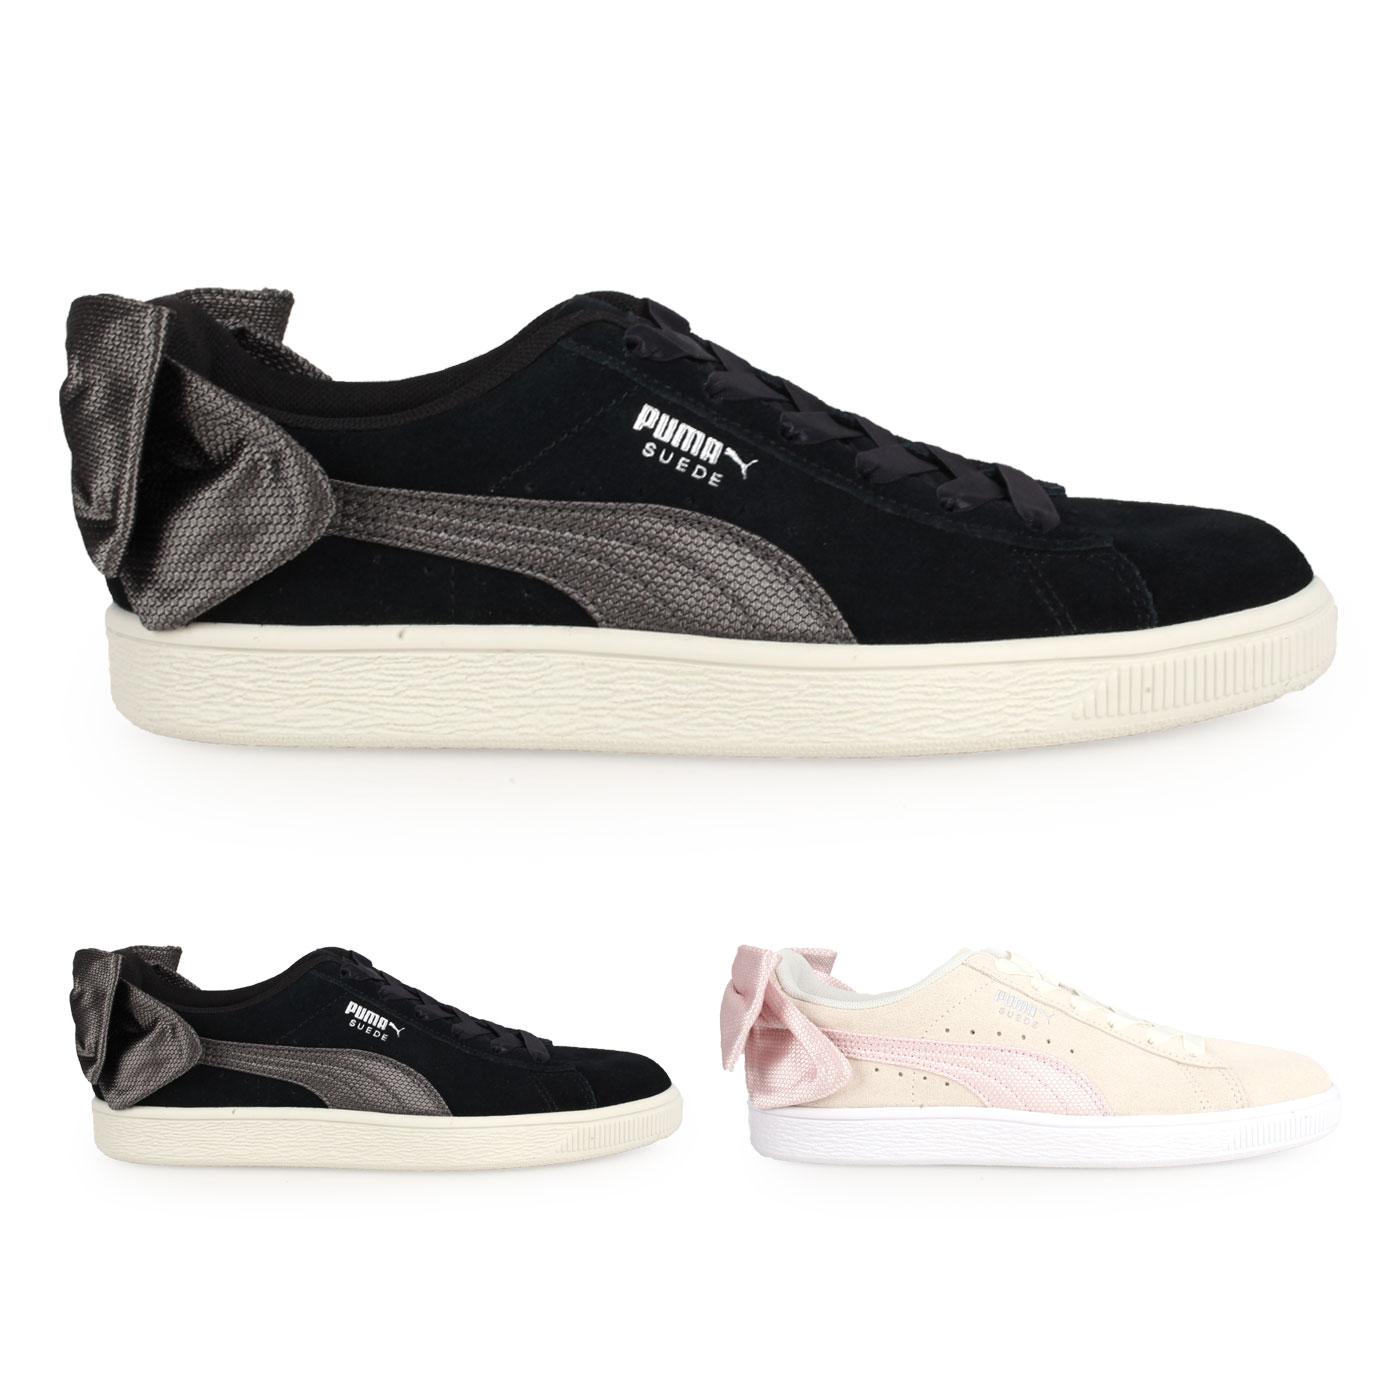 PUMA 女款休閒運動鞋(蝴蝶結款)  @Suede Bow Hexamesh Wn's@36915102